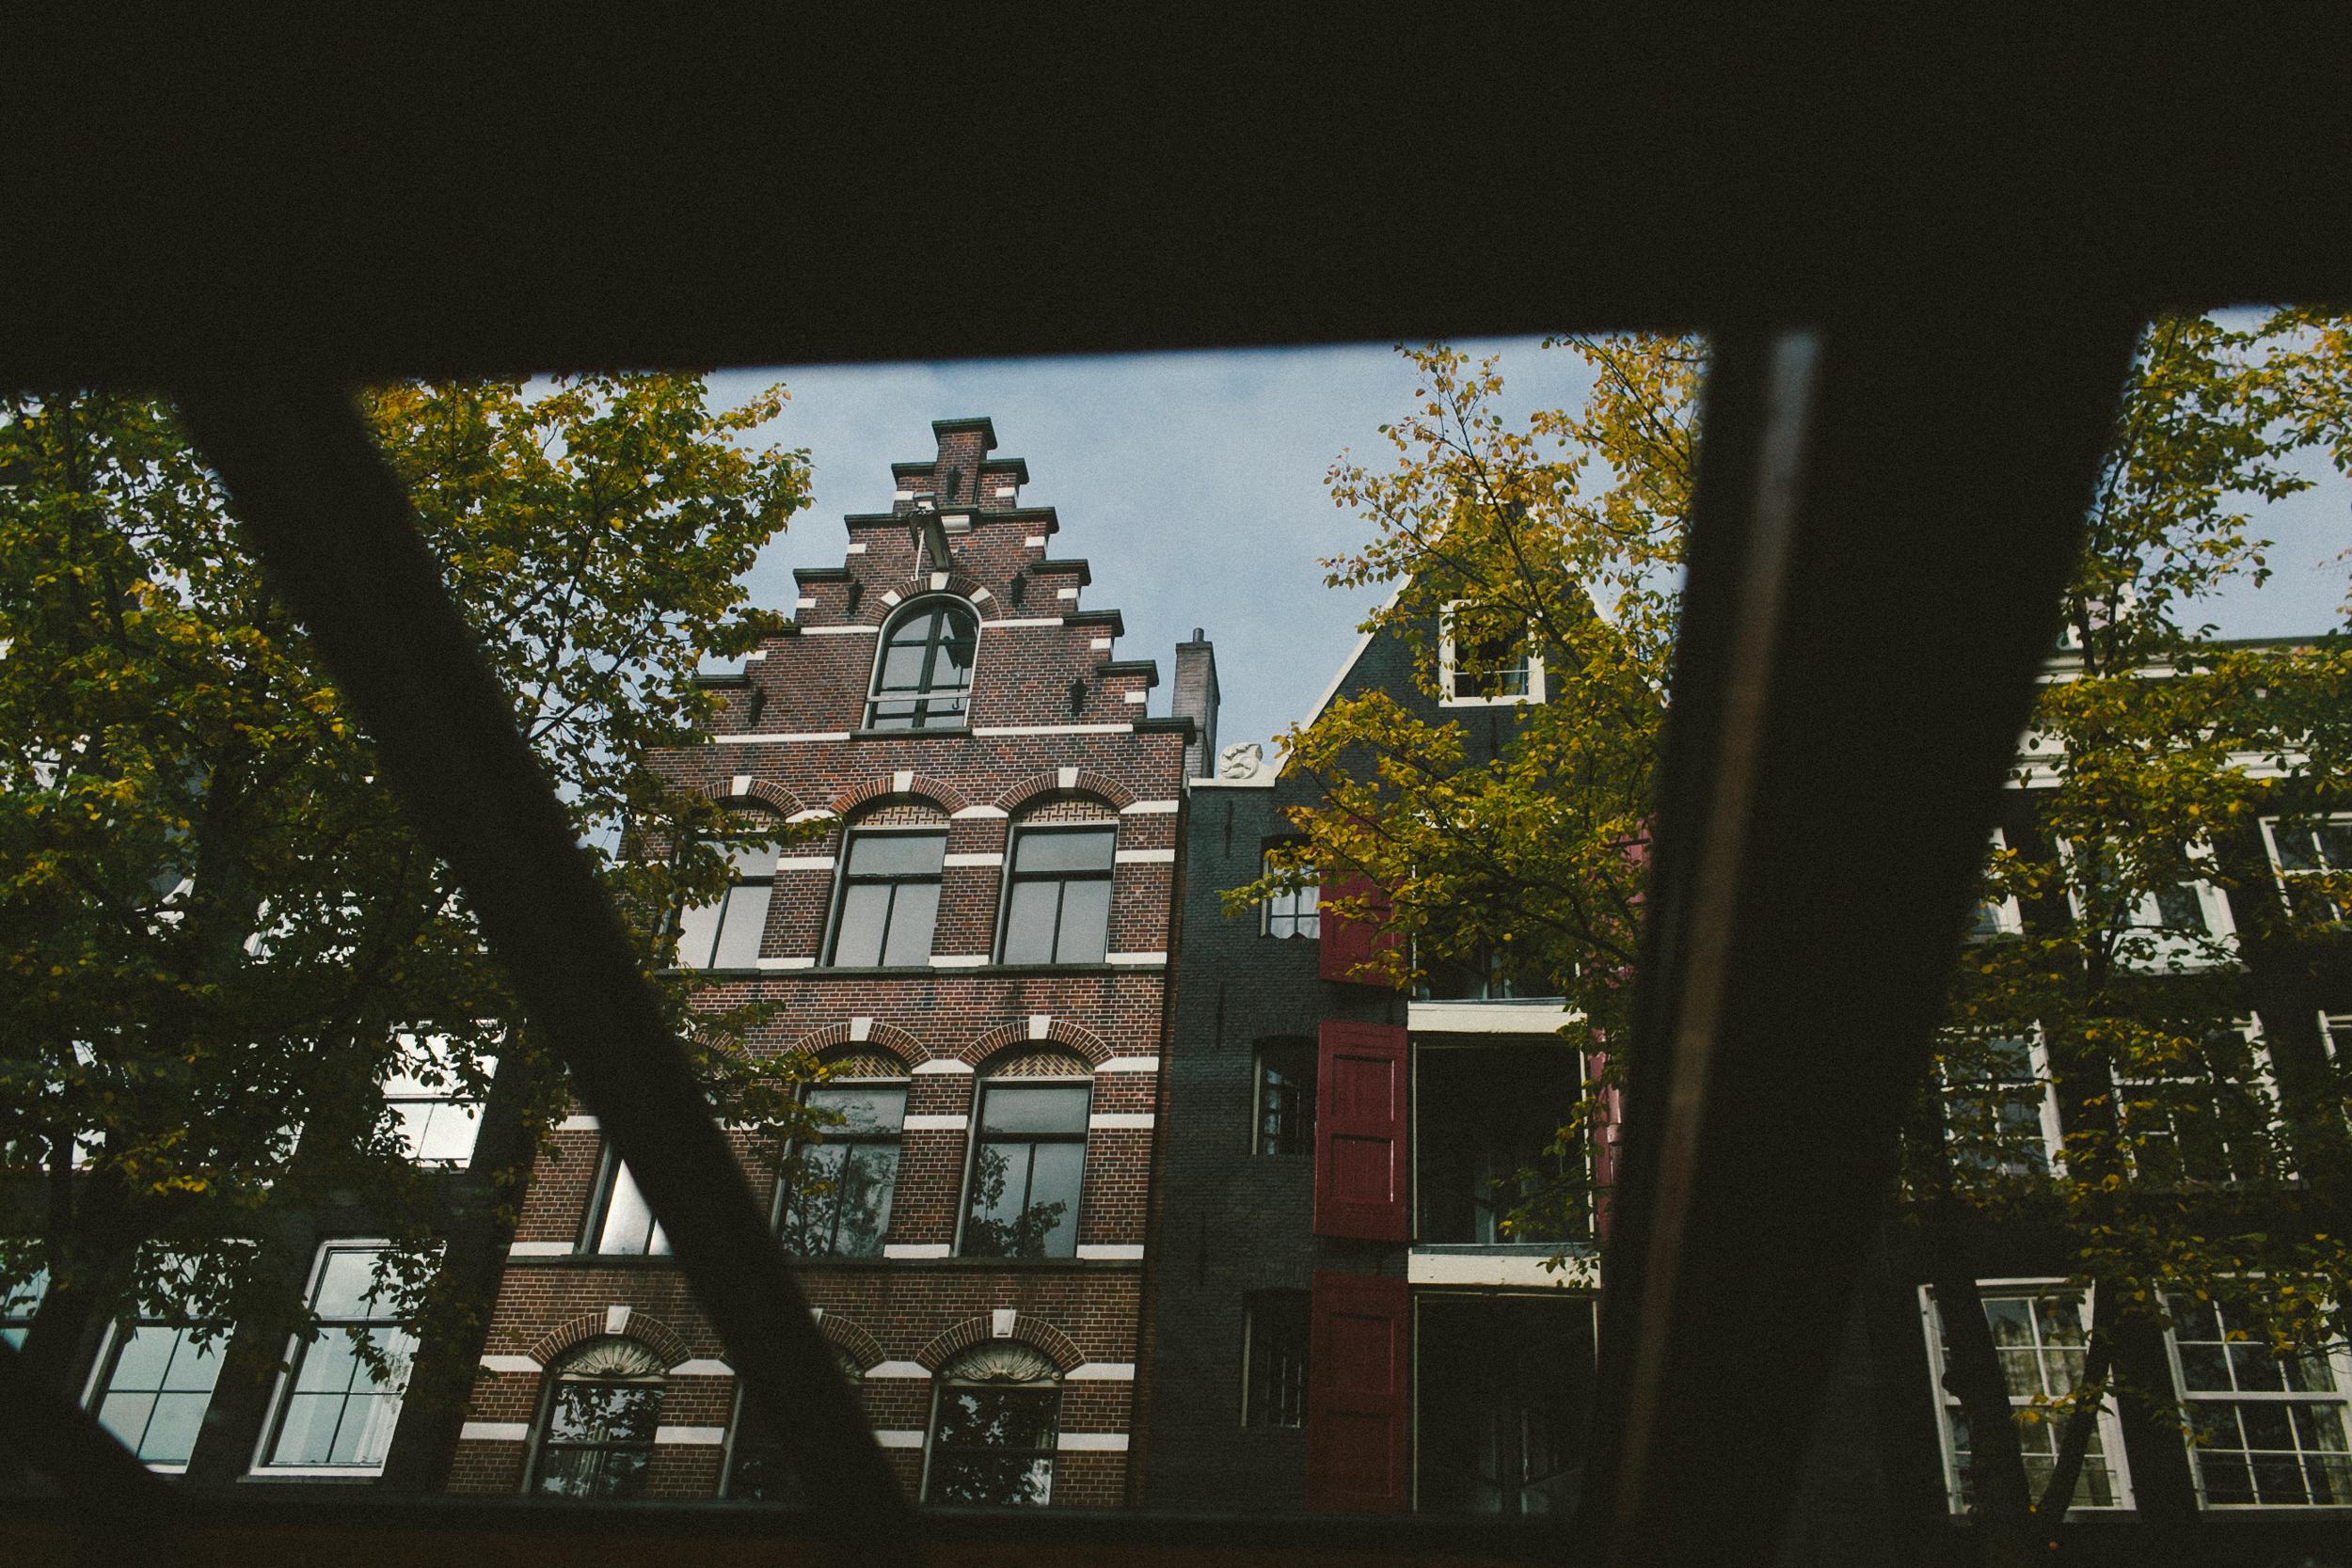 amsterdam_sqsp_31.jpg